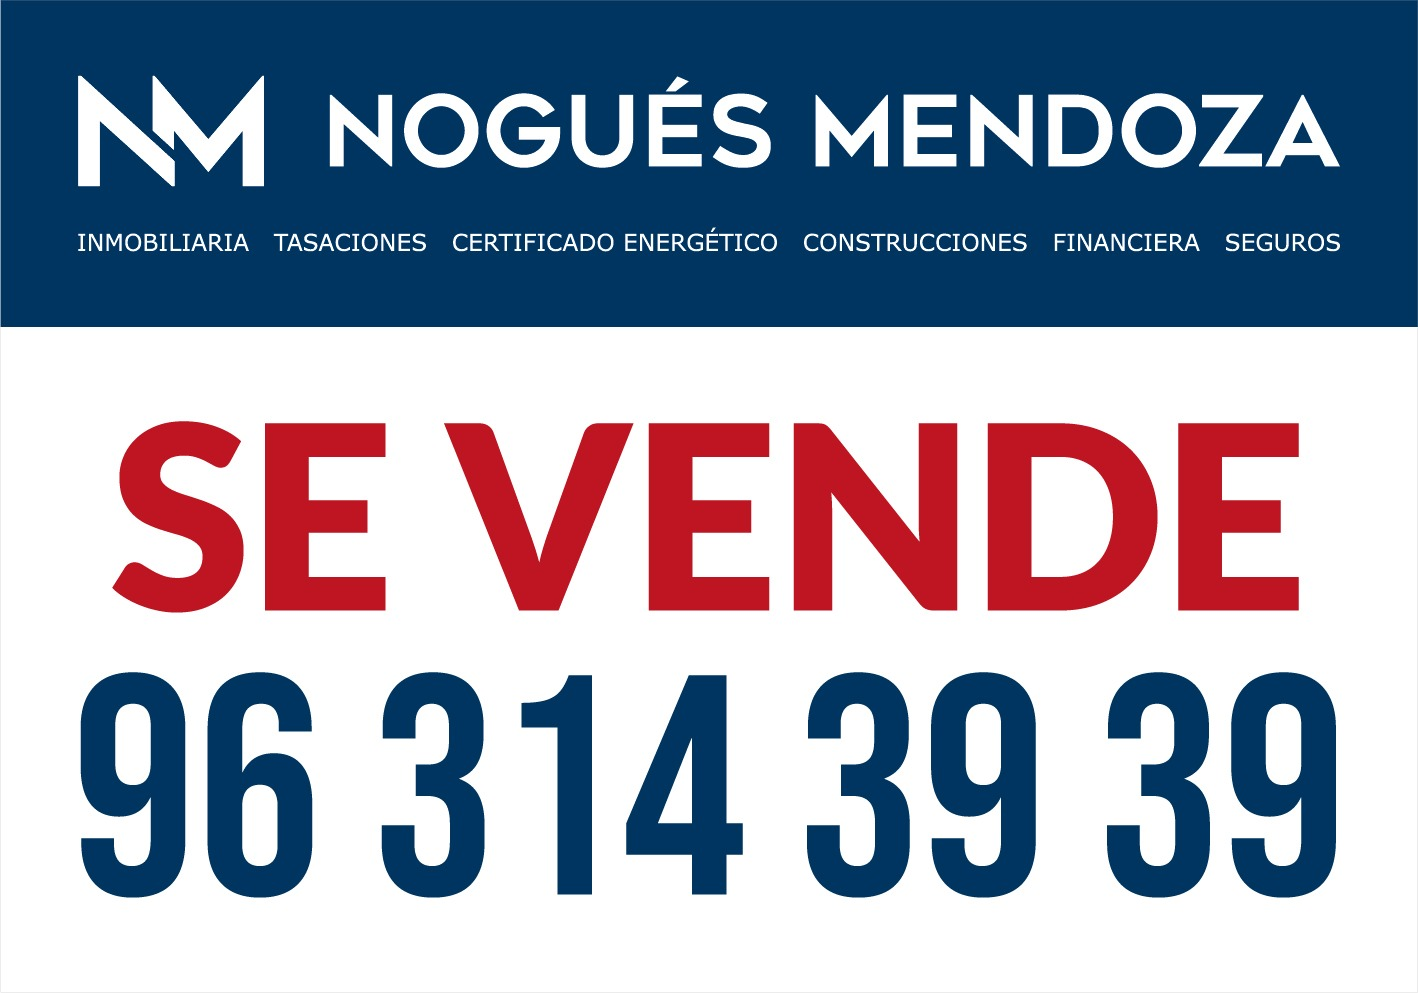 Nogués Mendoza